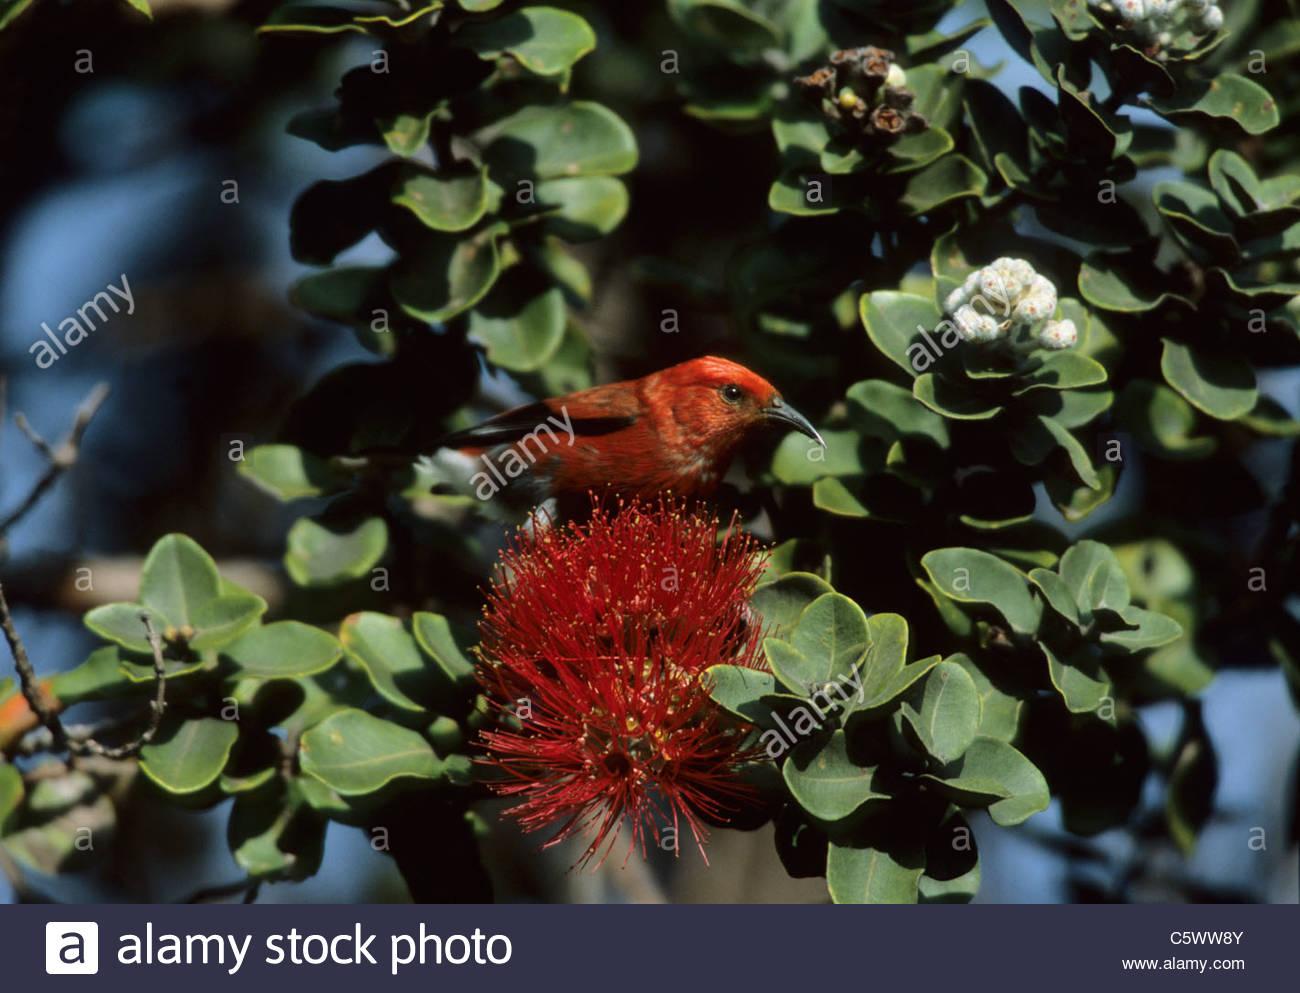 Apapane - am Ohio Blume Himatione sanguineaund Big Island, Hawaii BI003583 Stockbild